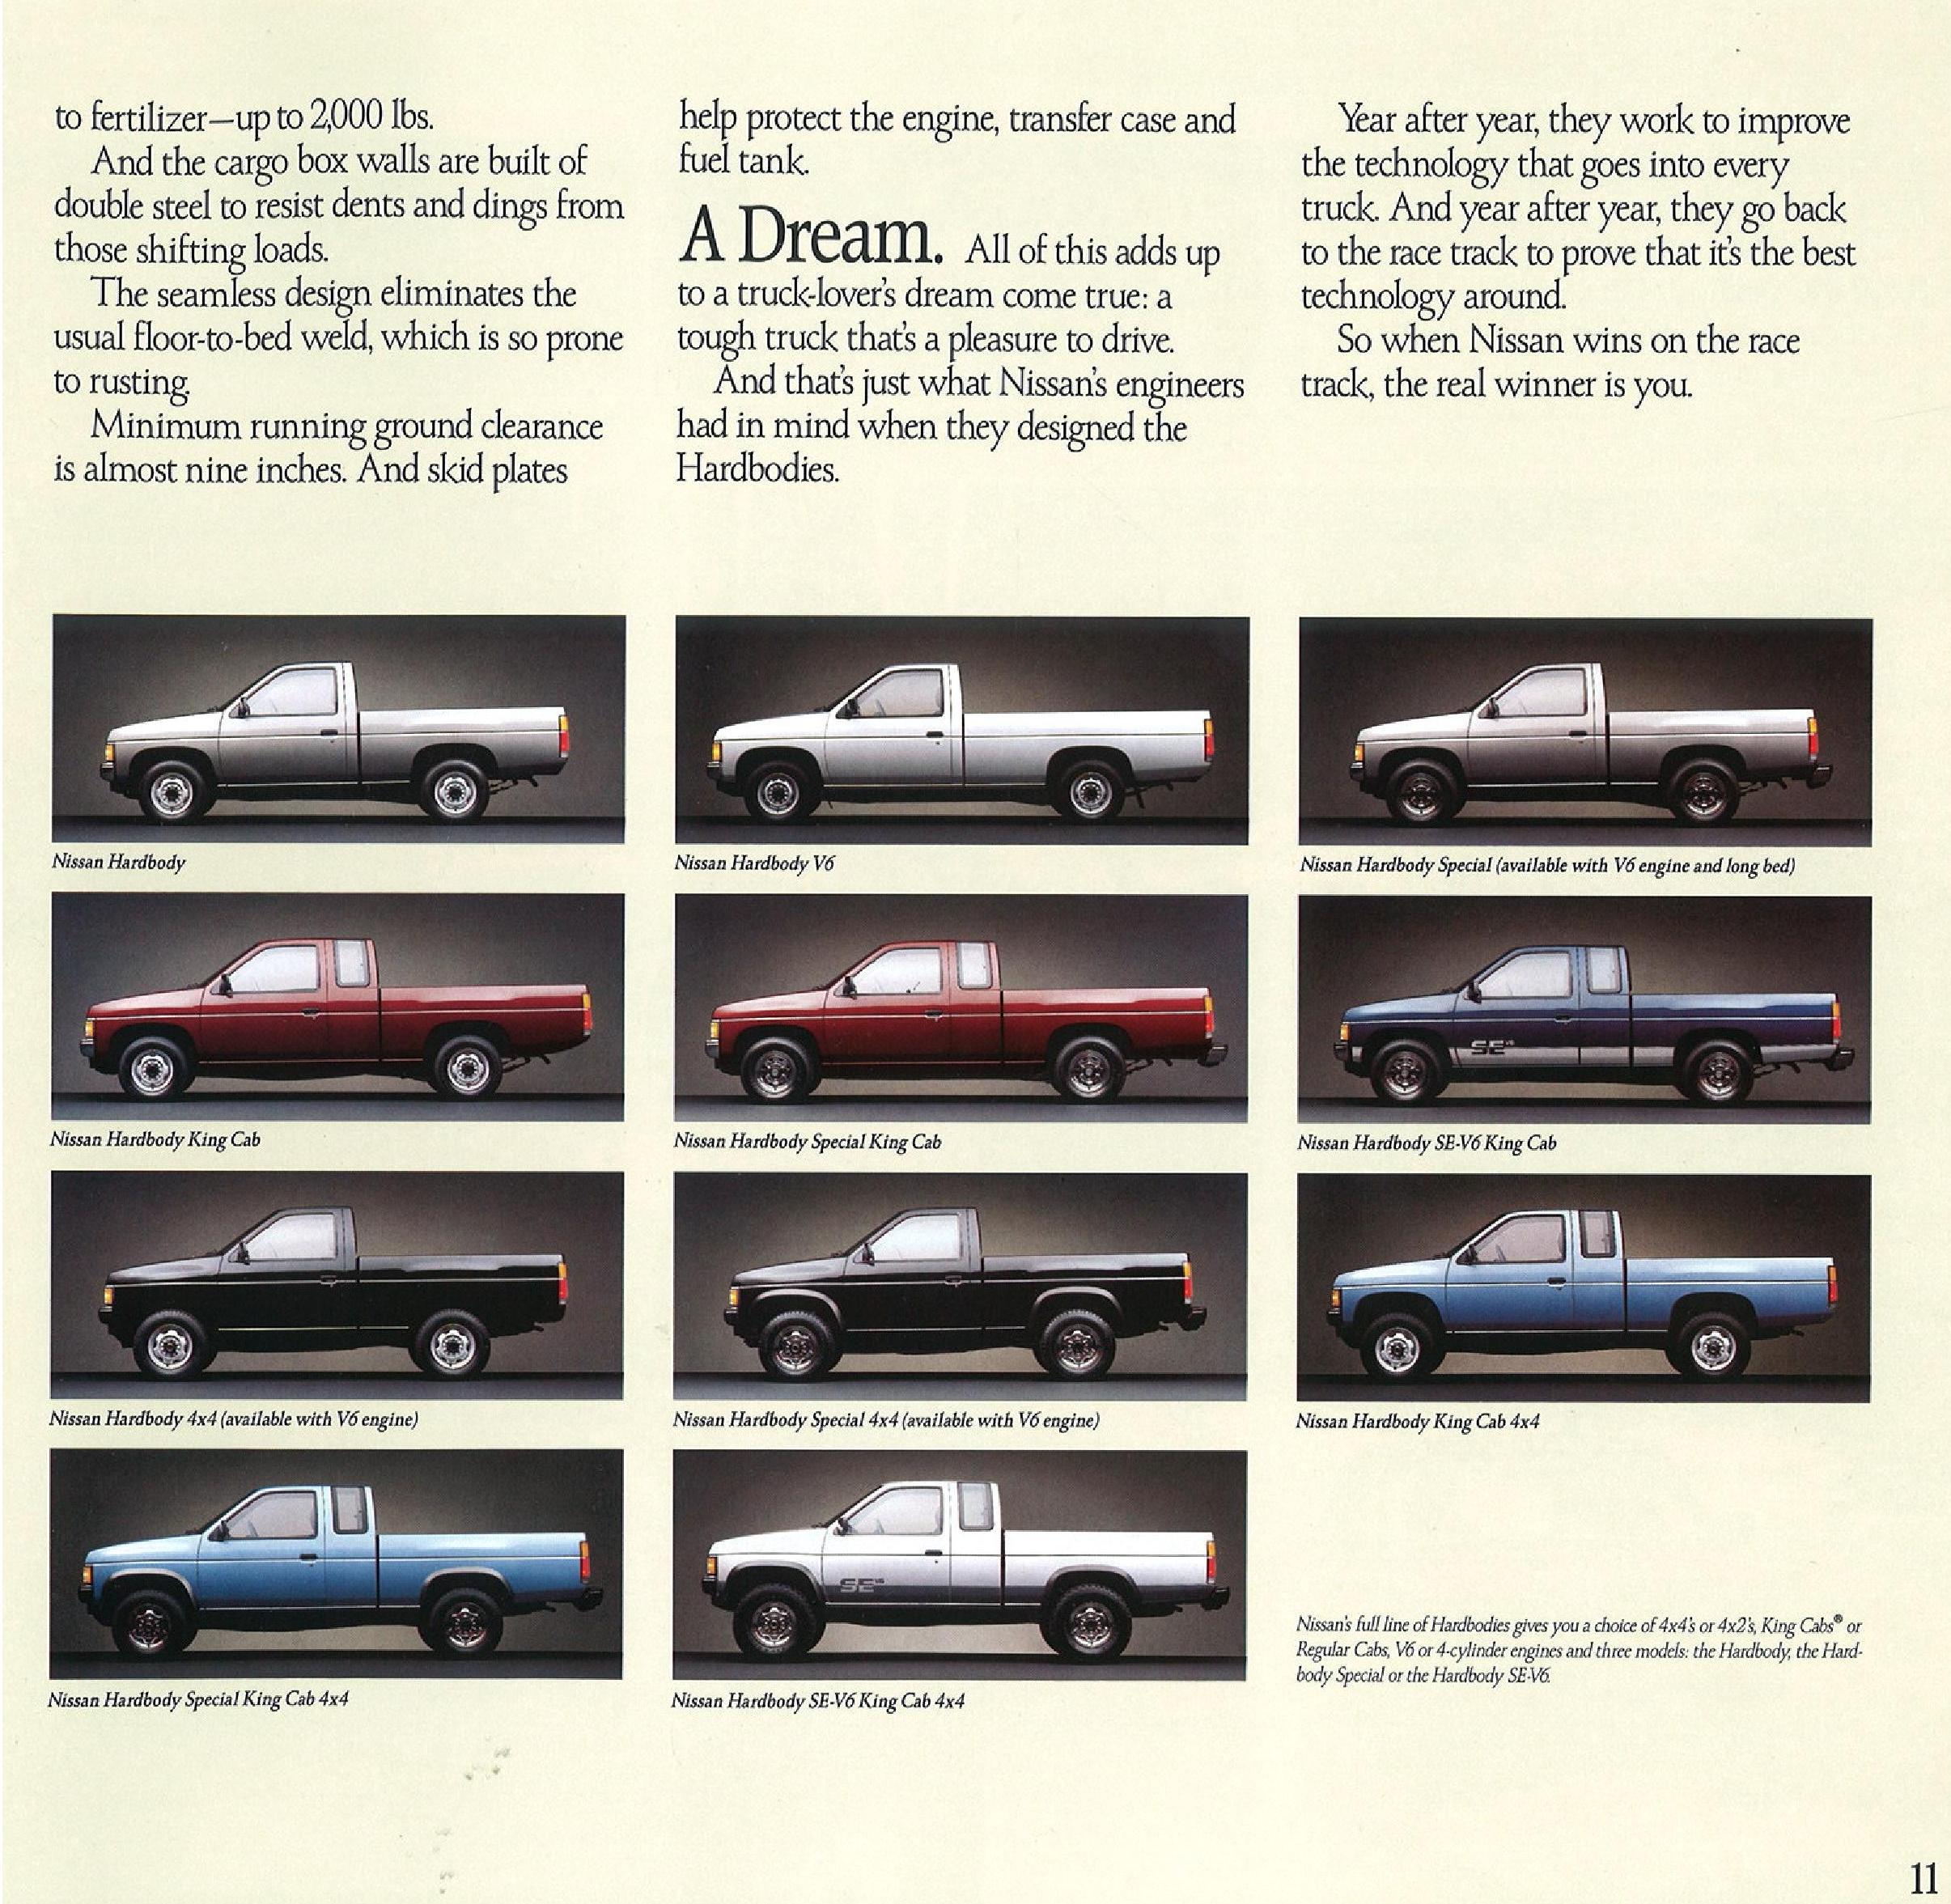 1989 Nissan Hardbody Dealer Brochure - NICOclub